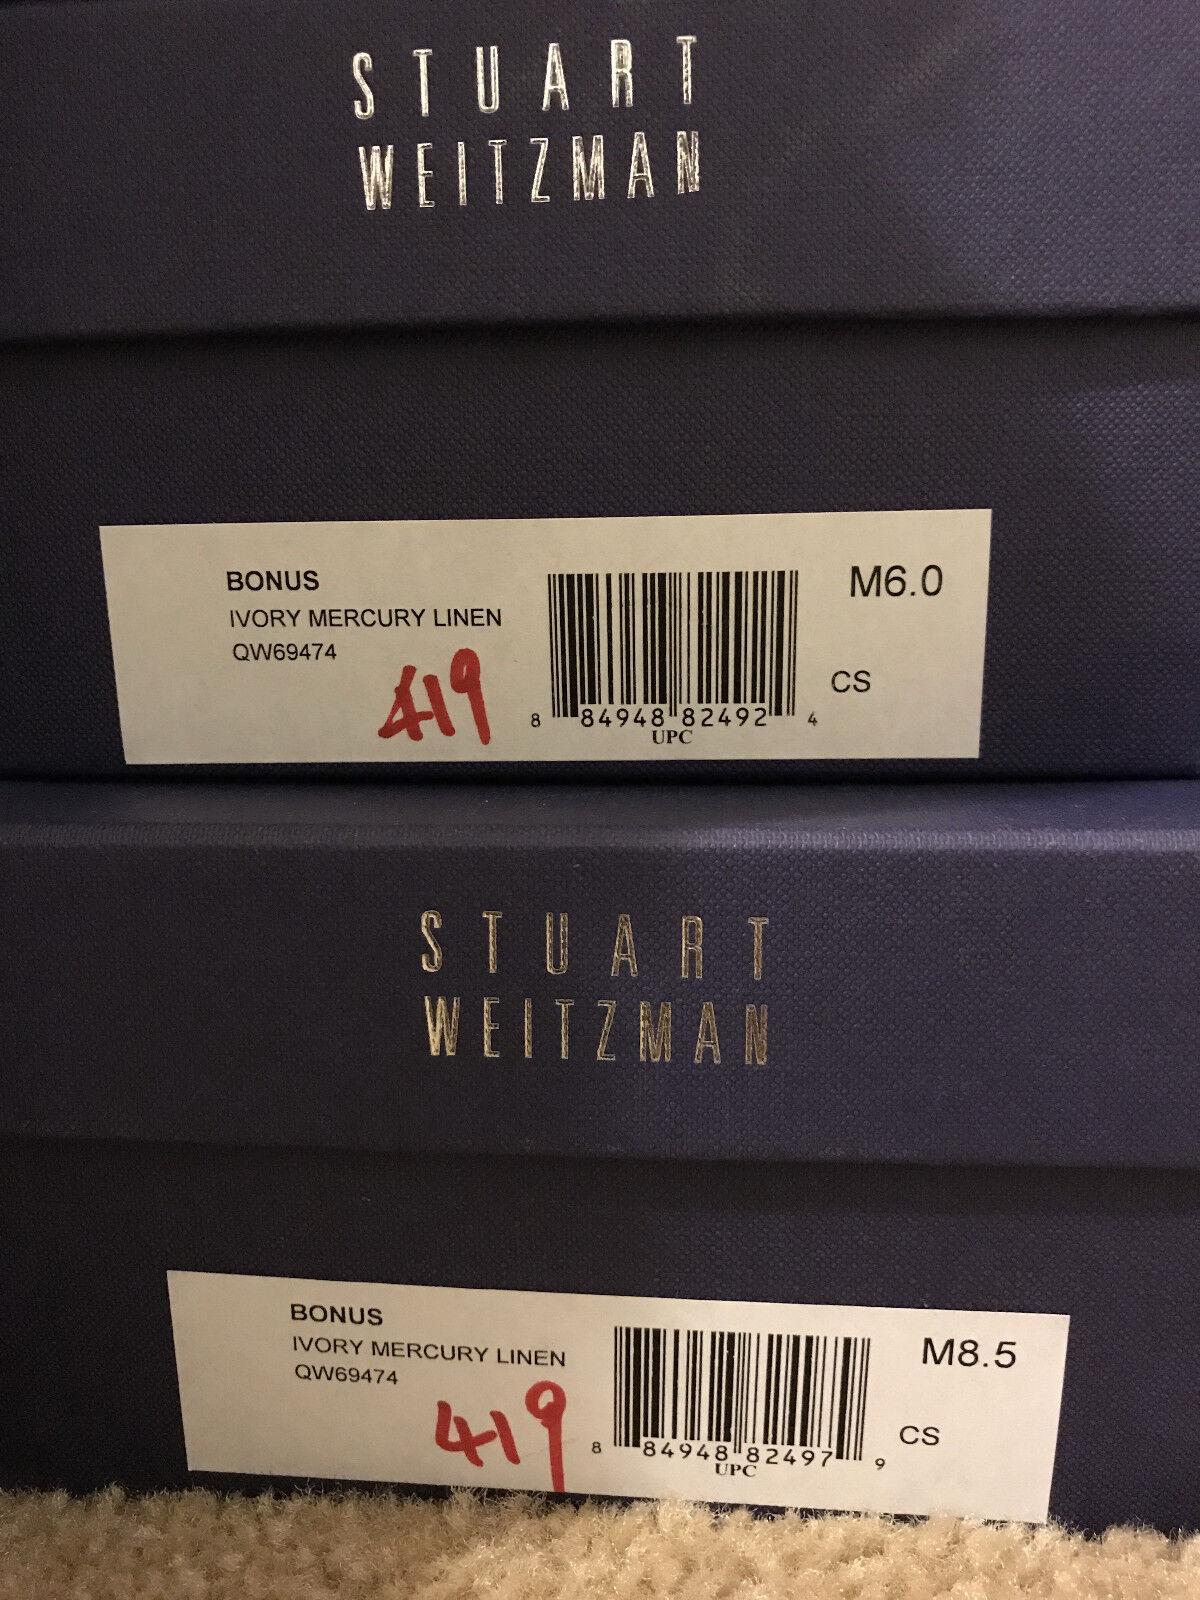 NIB Stuart Weitzman Bonus 6.5 8 8 8 ivory mercury linen, leather piping with bow a781d1